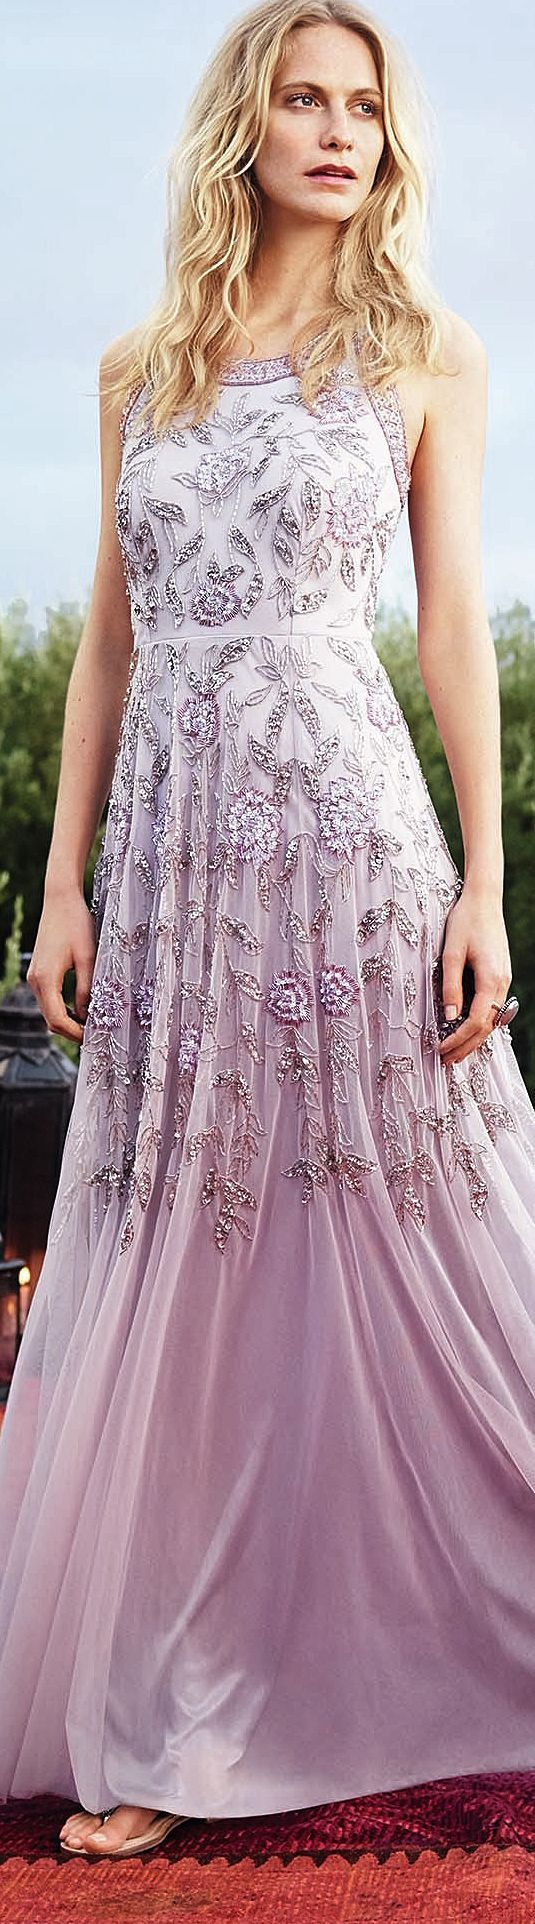 Nice Casual Wedding Dresses Wedding Dresses for Older